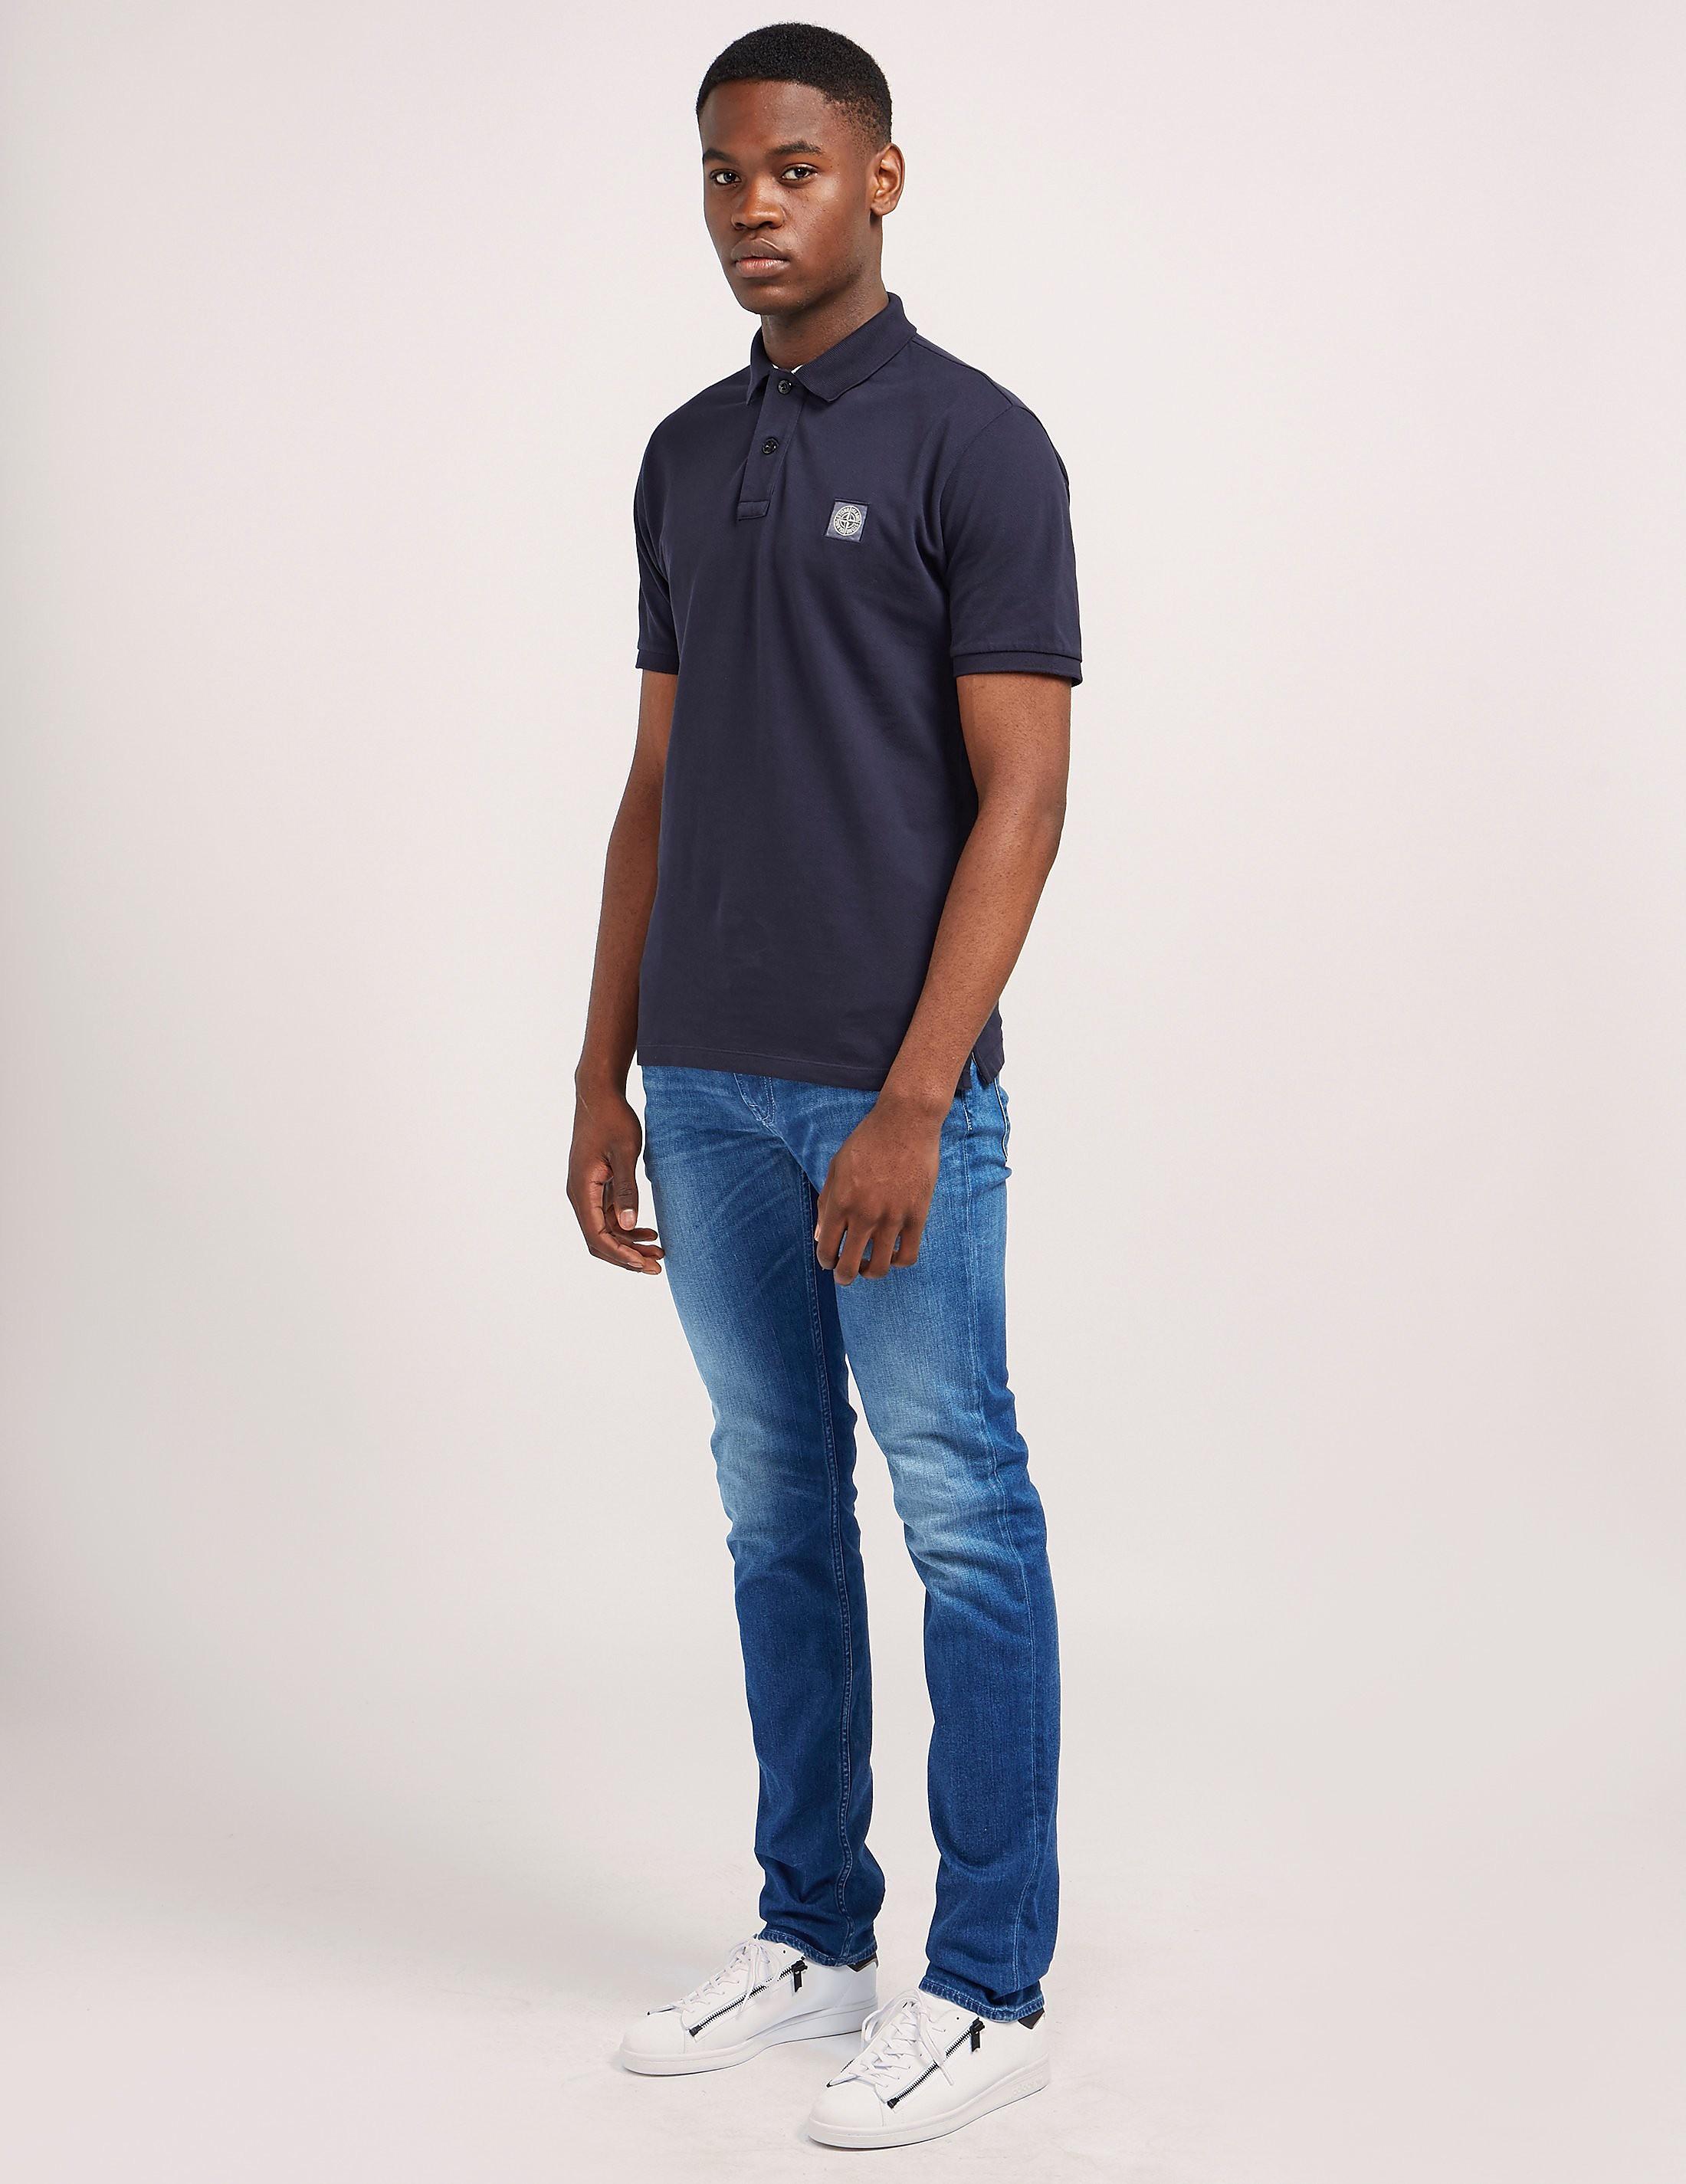 Stone Island Short Sleeve Polo Shirt